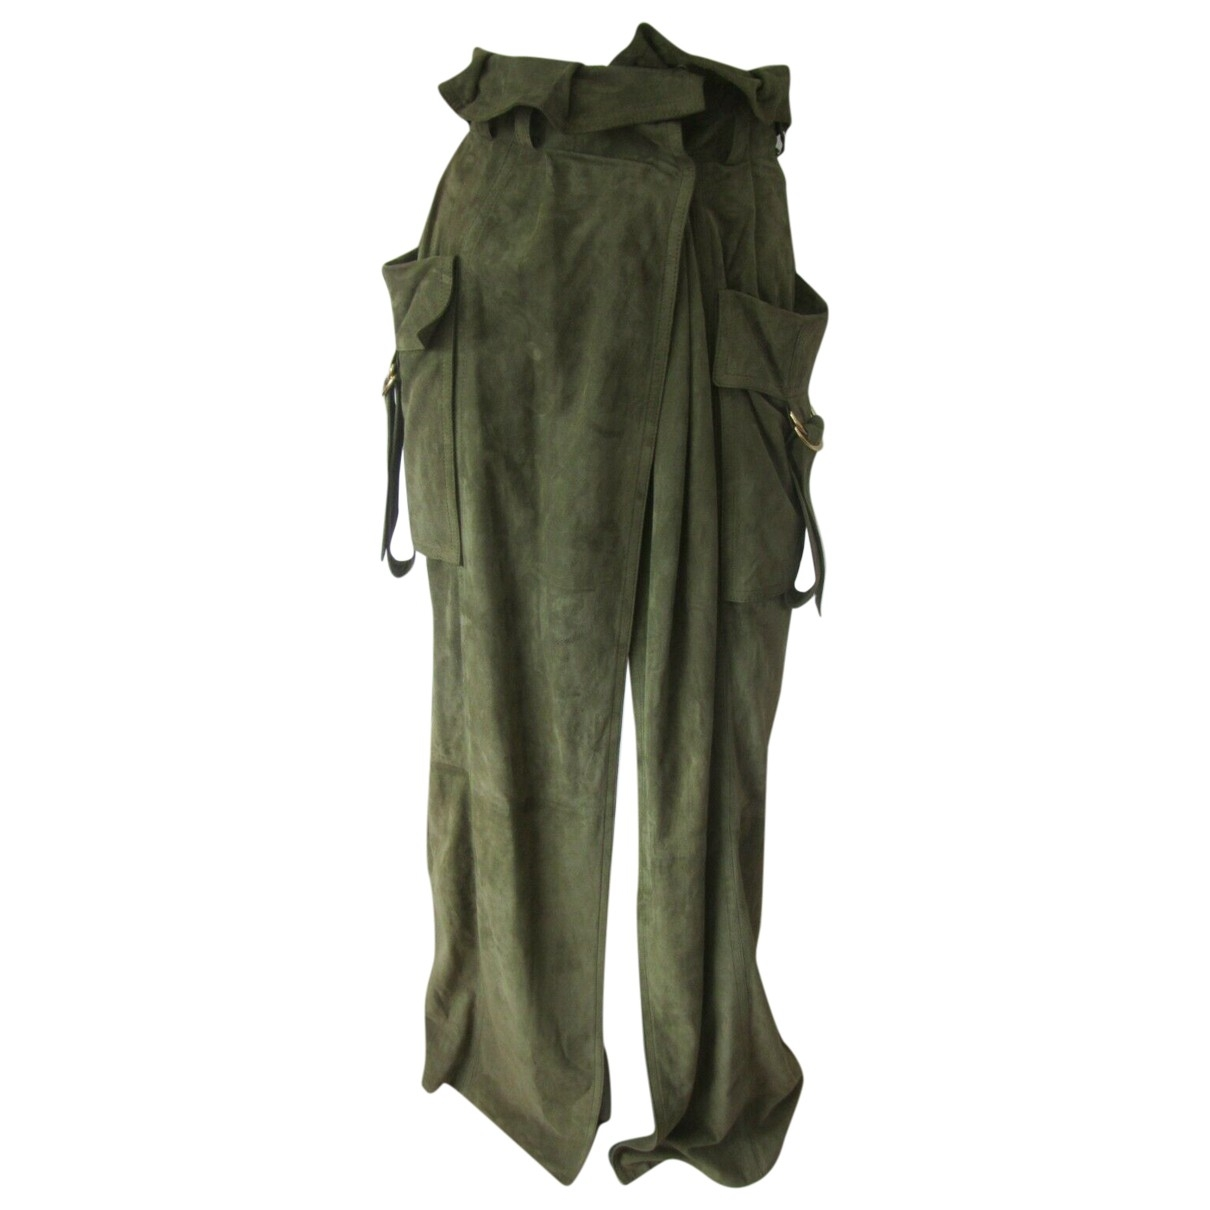 Balmain \N Green Suede skirt for Women 36 FR